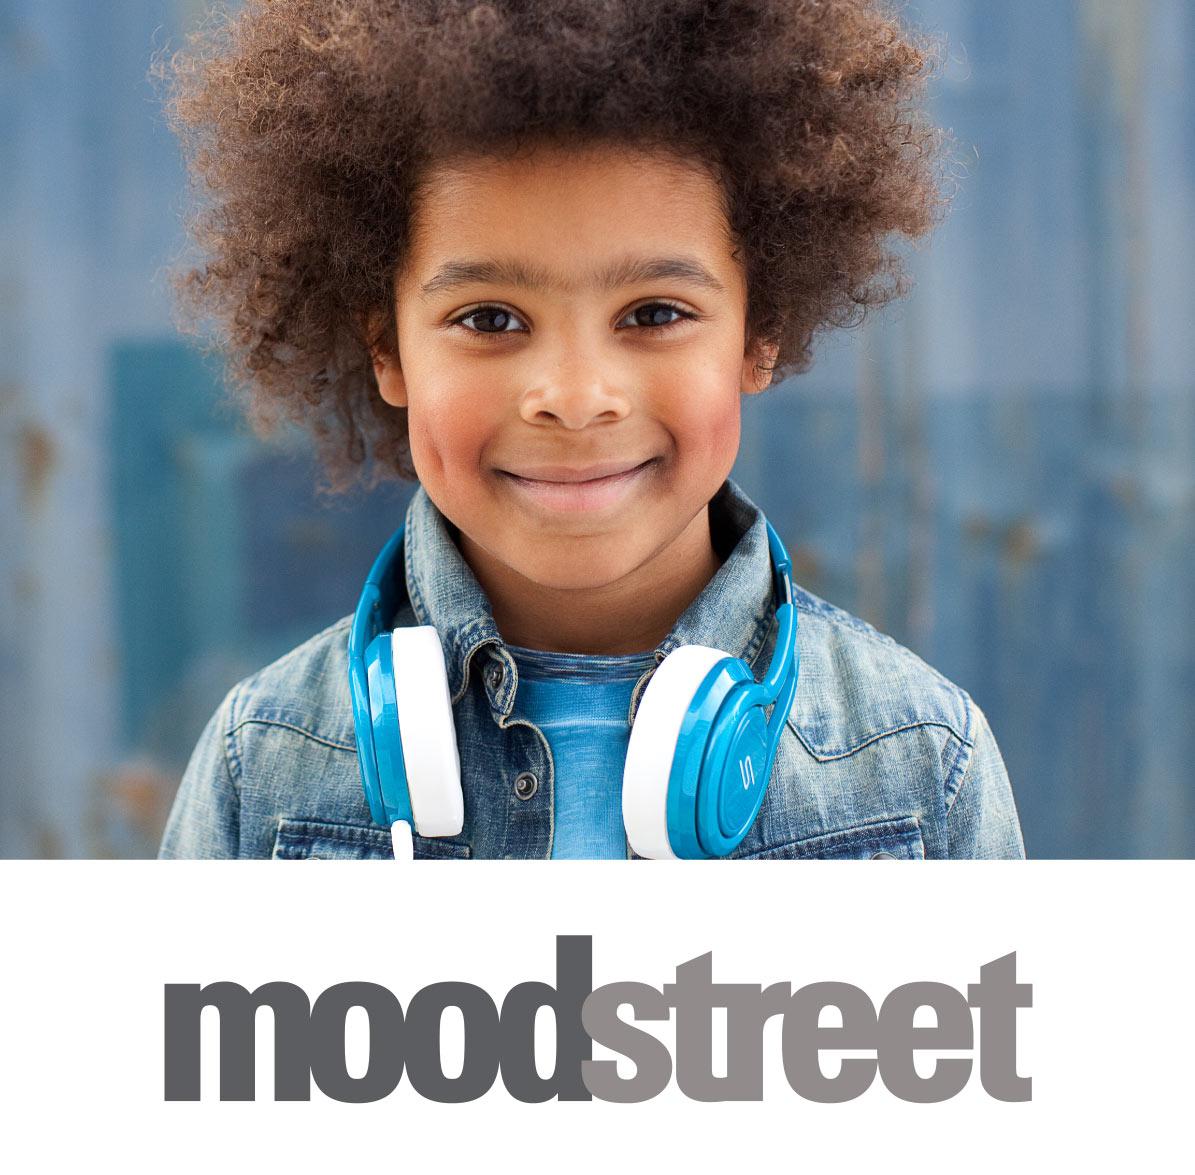 Template-brands-overview_MOODSTREET_Brands-overview